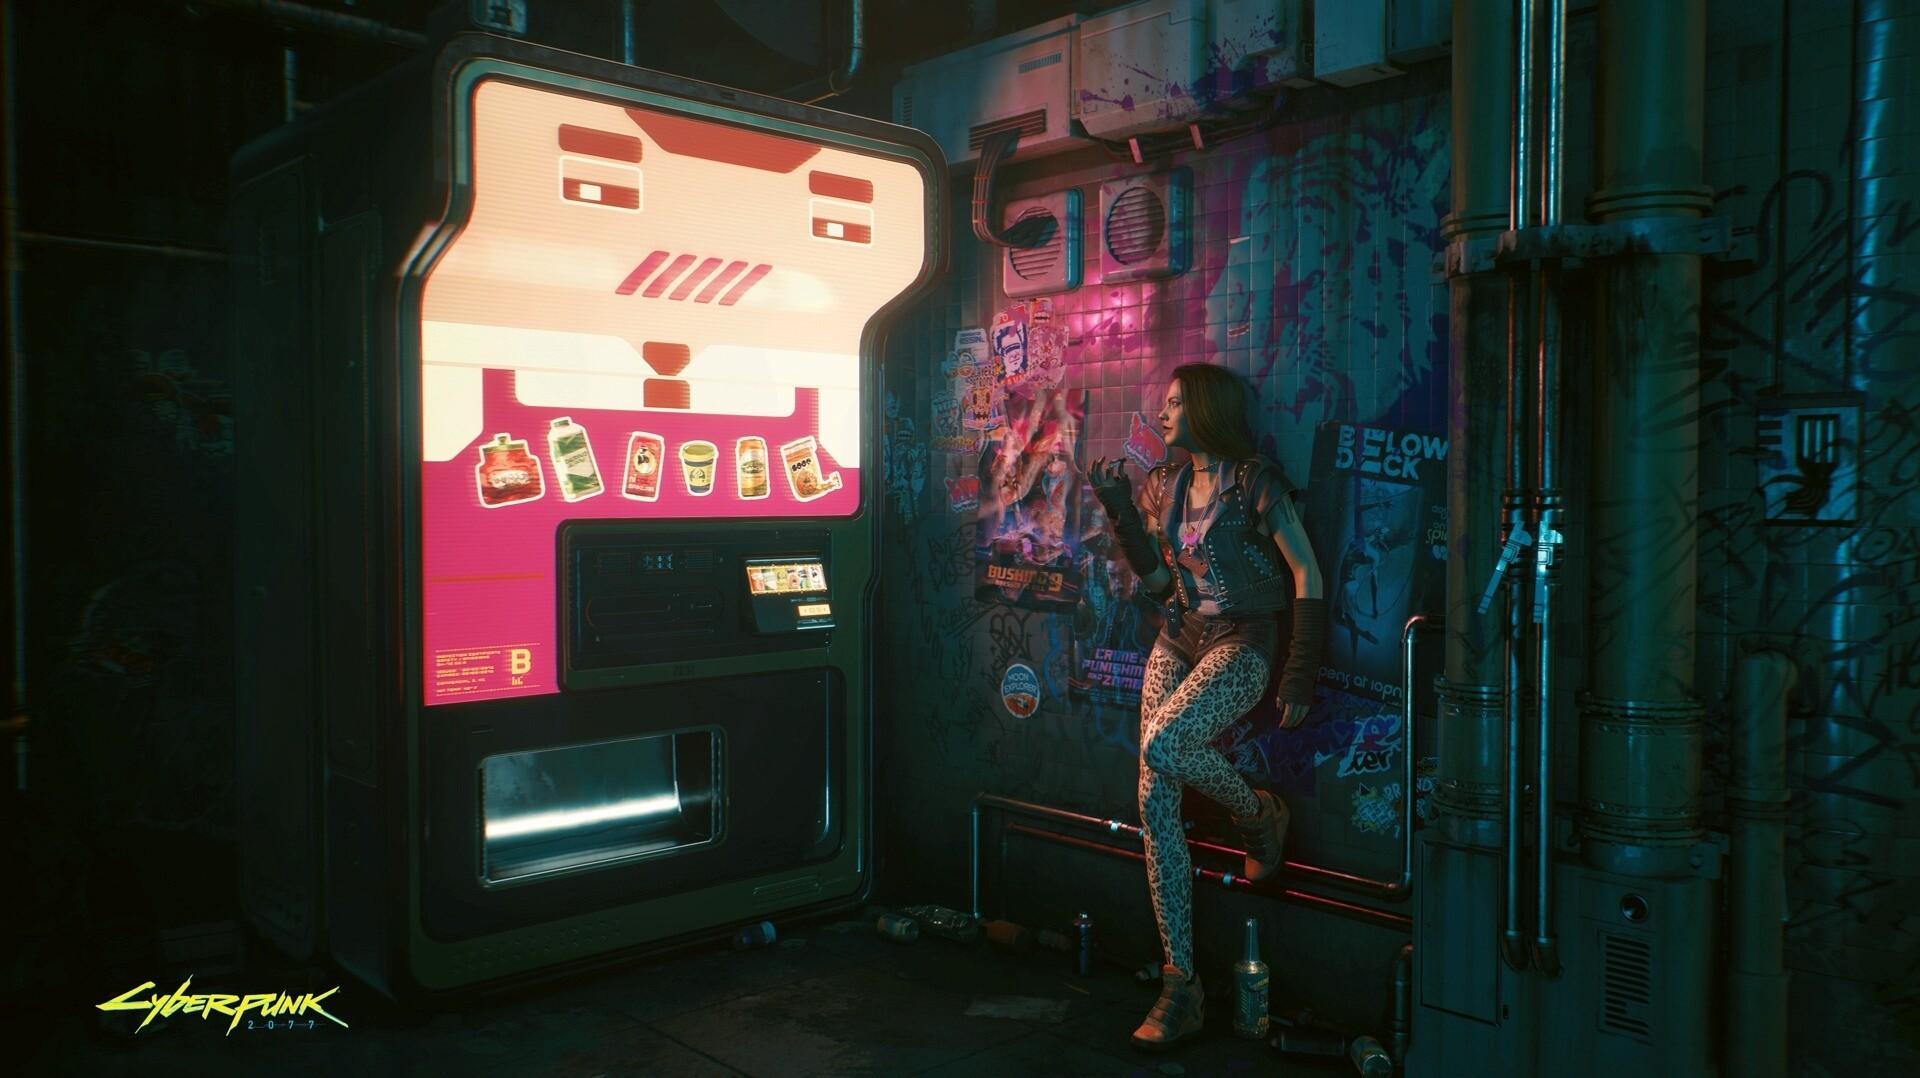 Брайан Декарт из Detroit: Become Human сыграл в Cyberpunk 2077